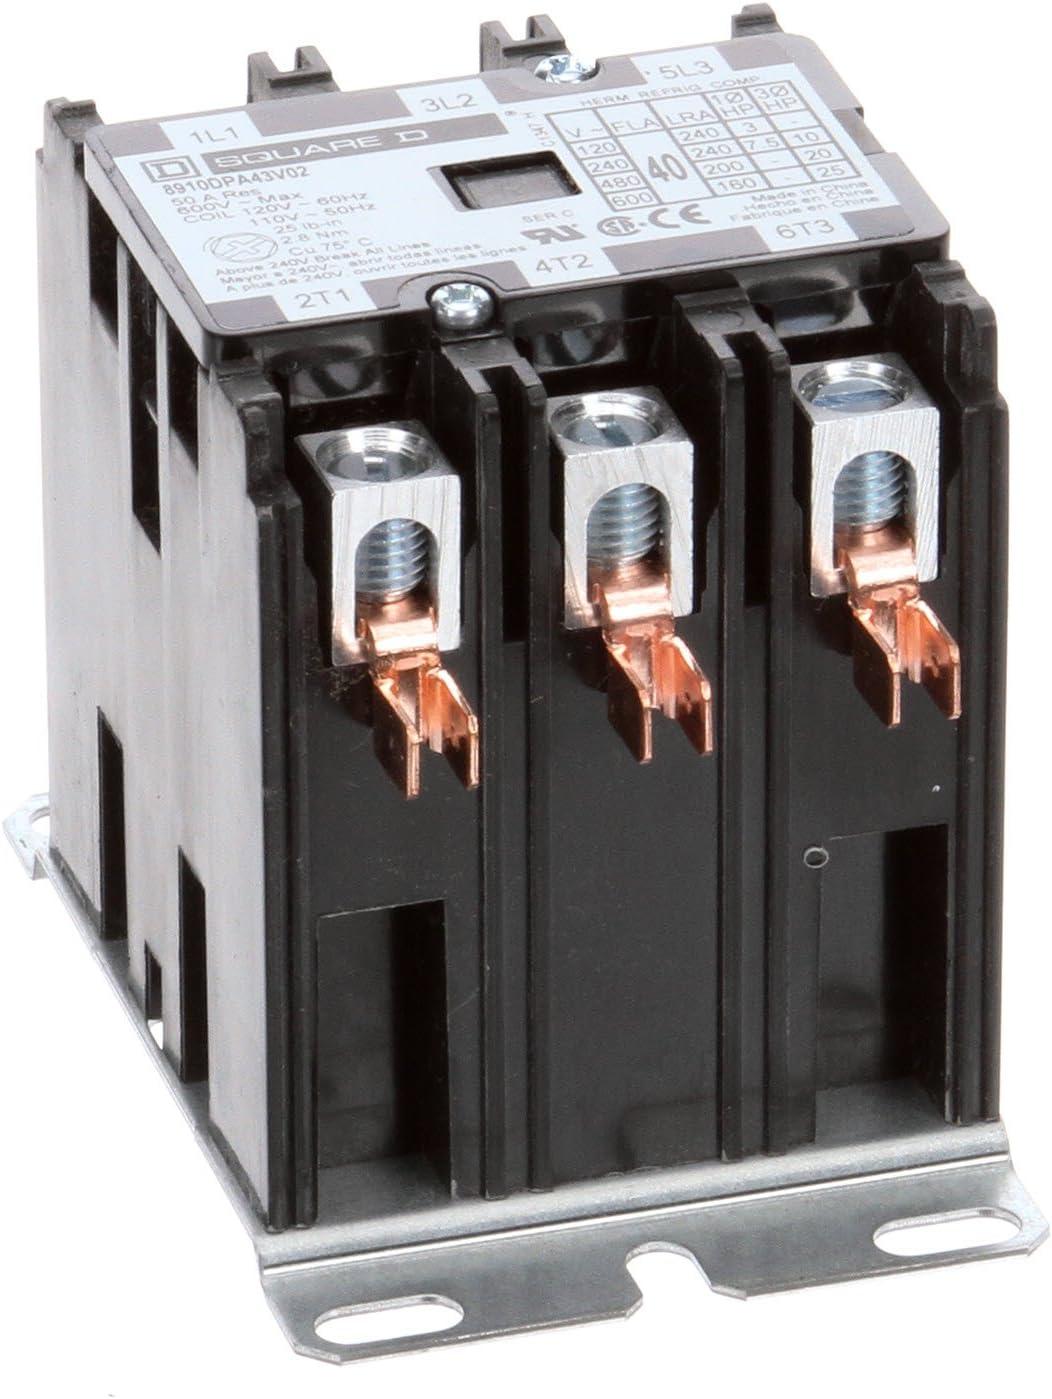 Cheap sale Cecilware Purchase CG12A 120-volt Square Coil D Contactor